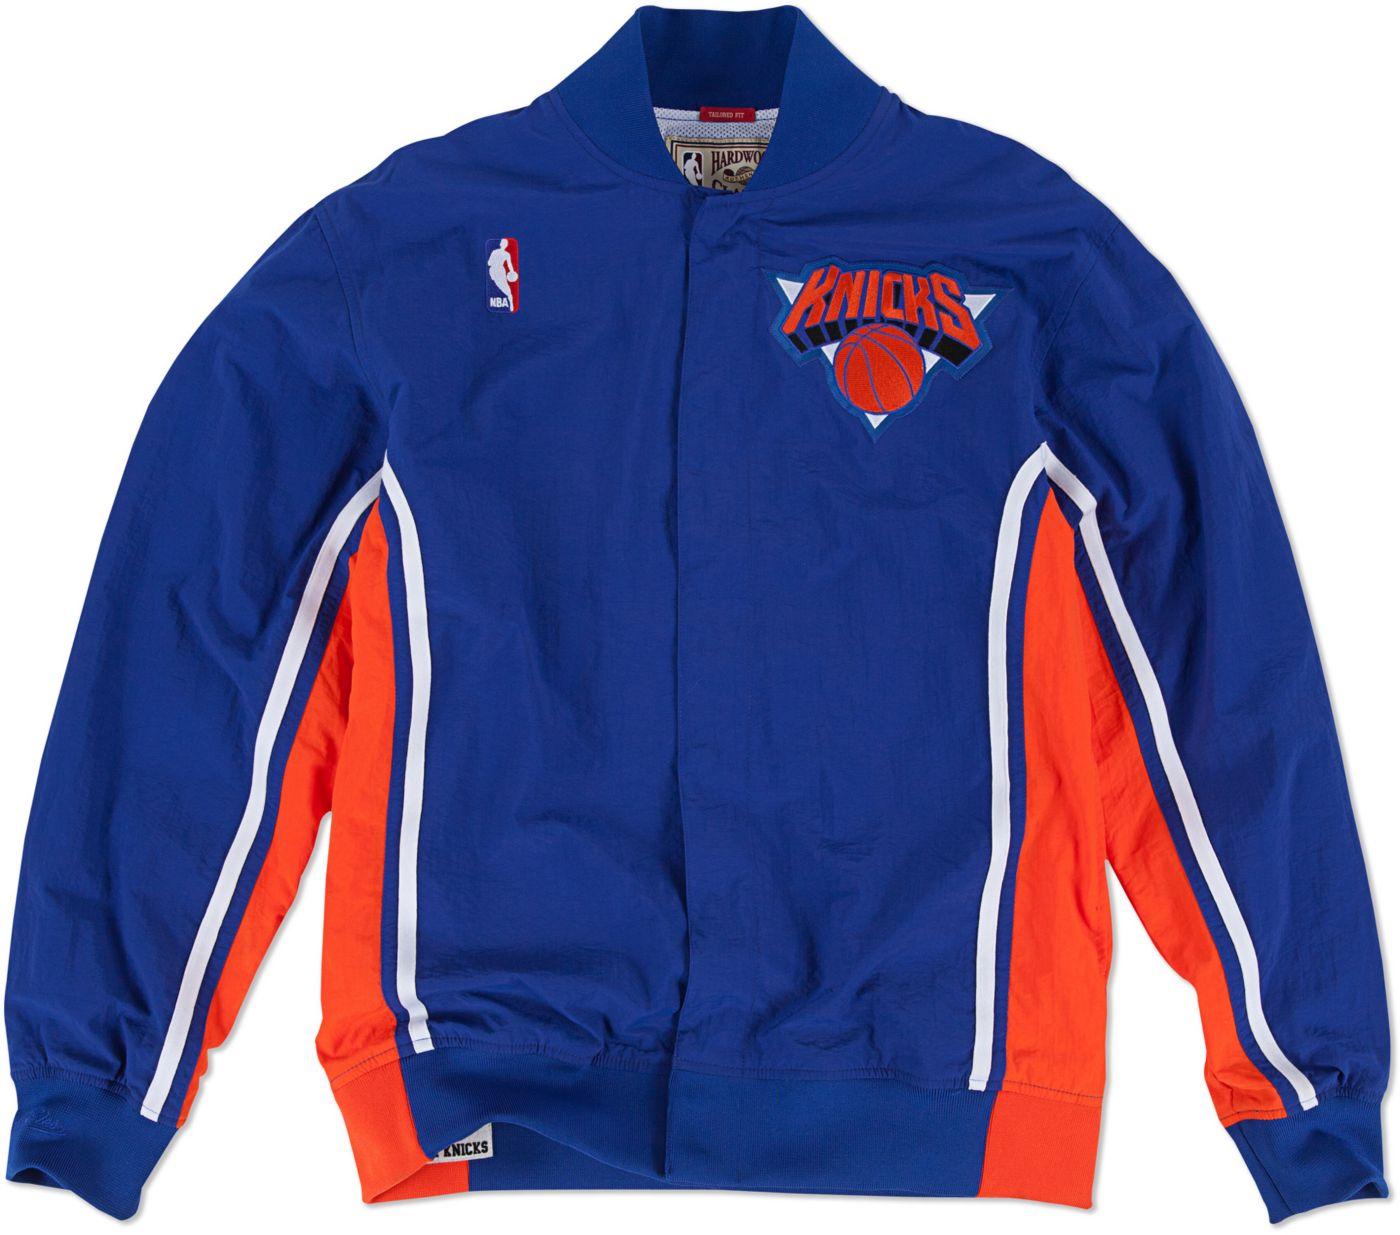 Mitchell & Ness Men's New York Knicks Authentic Warm Up Jacket